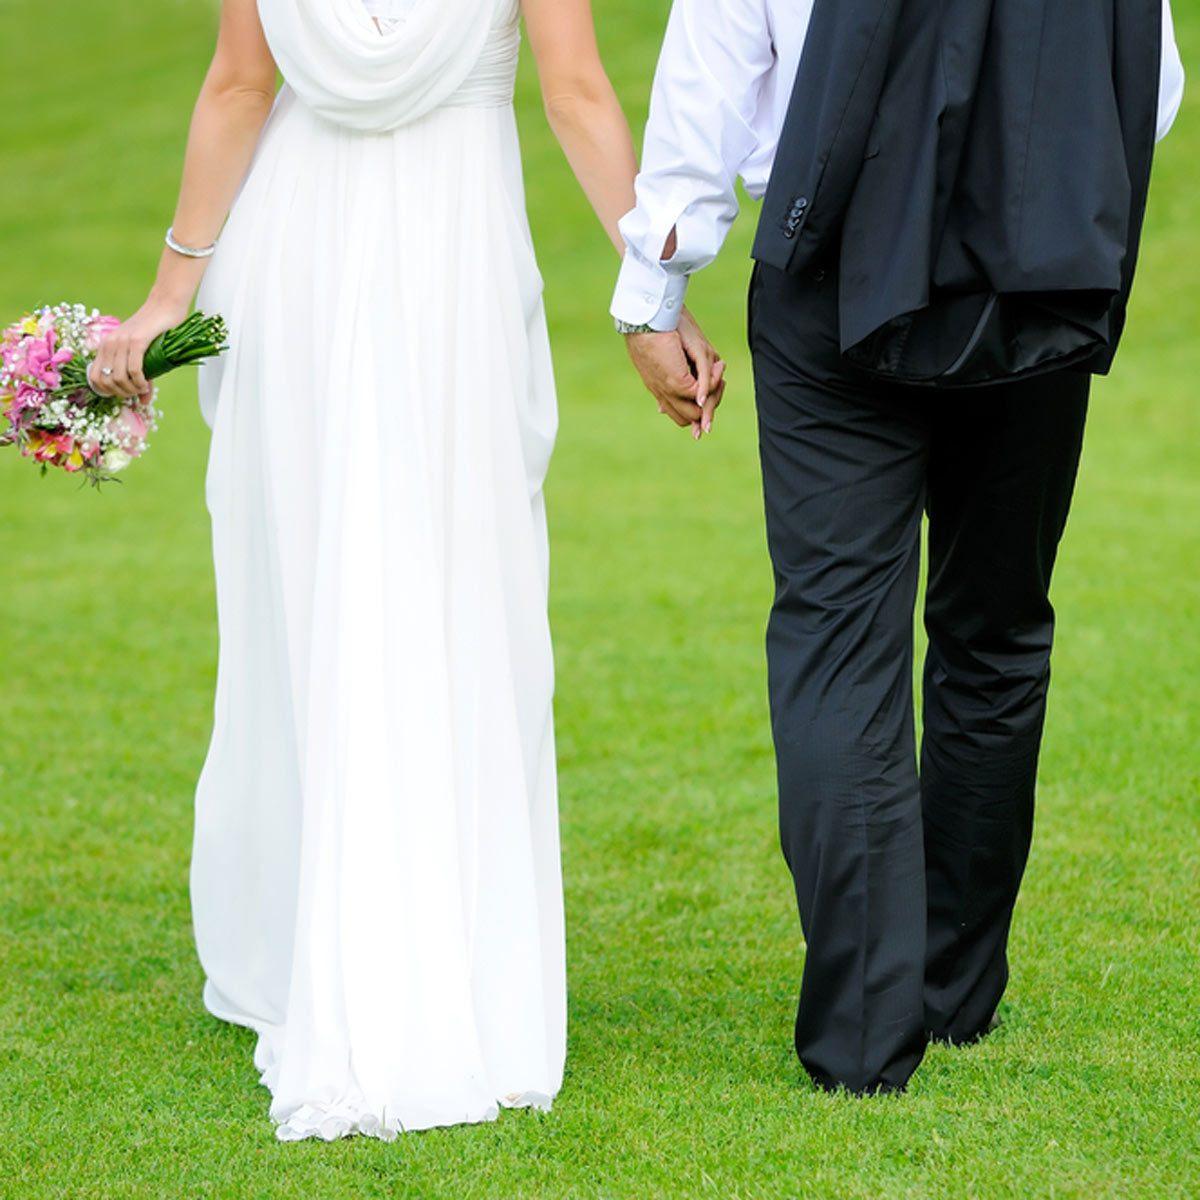 backyard wedding green grass bride and groom